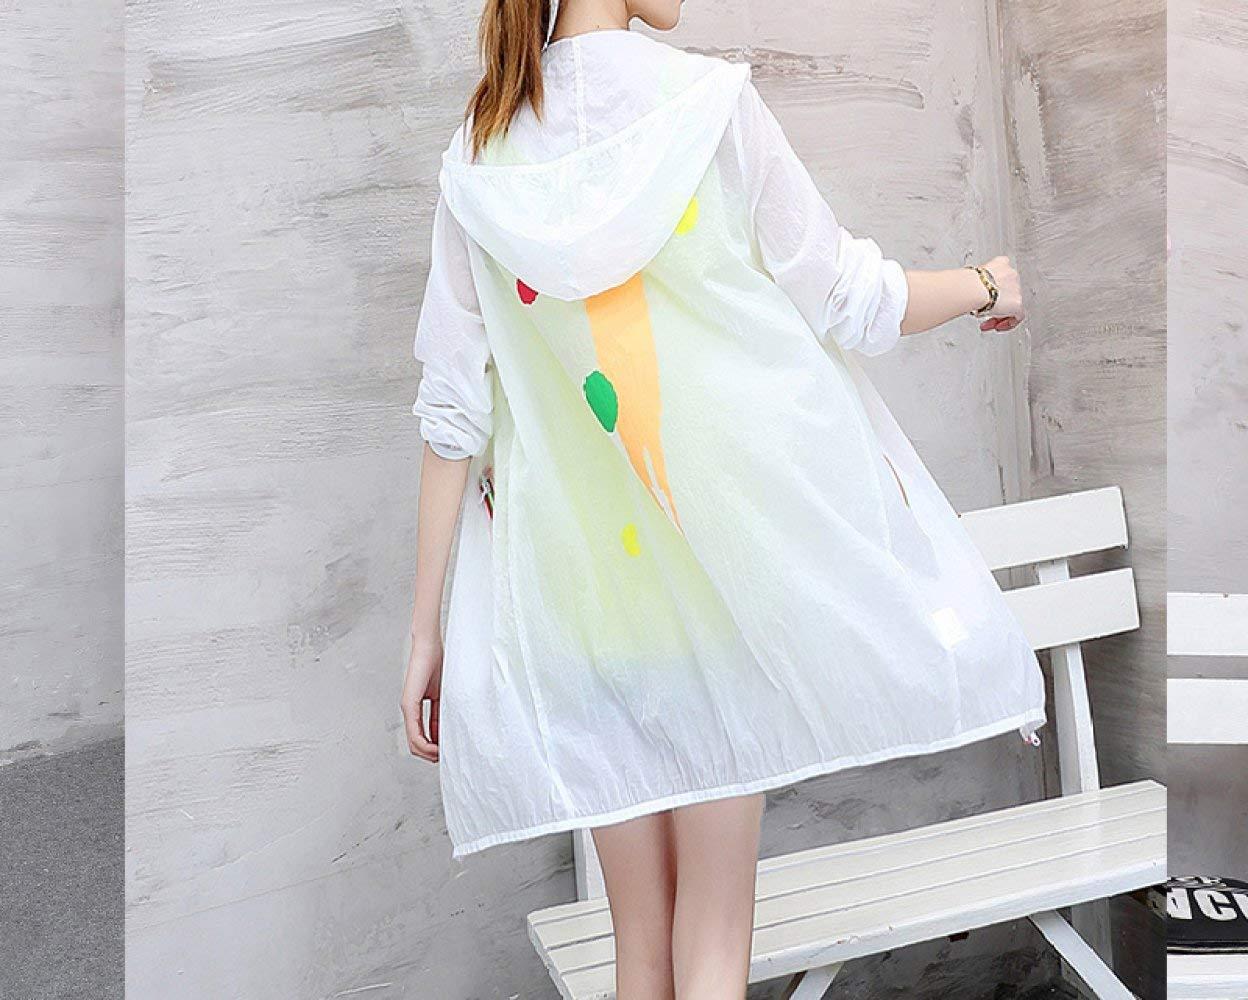 MOM 2018 summer women's sun protection clothing women's casual sunscreen clothing chiffon shirt long sleeve jacket